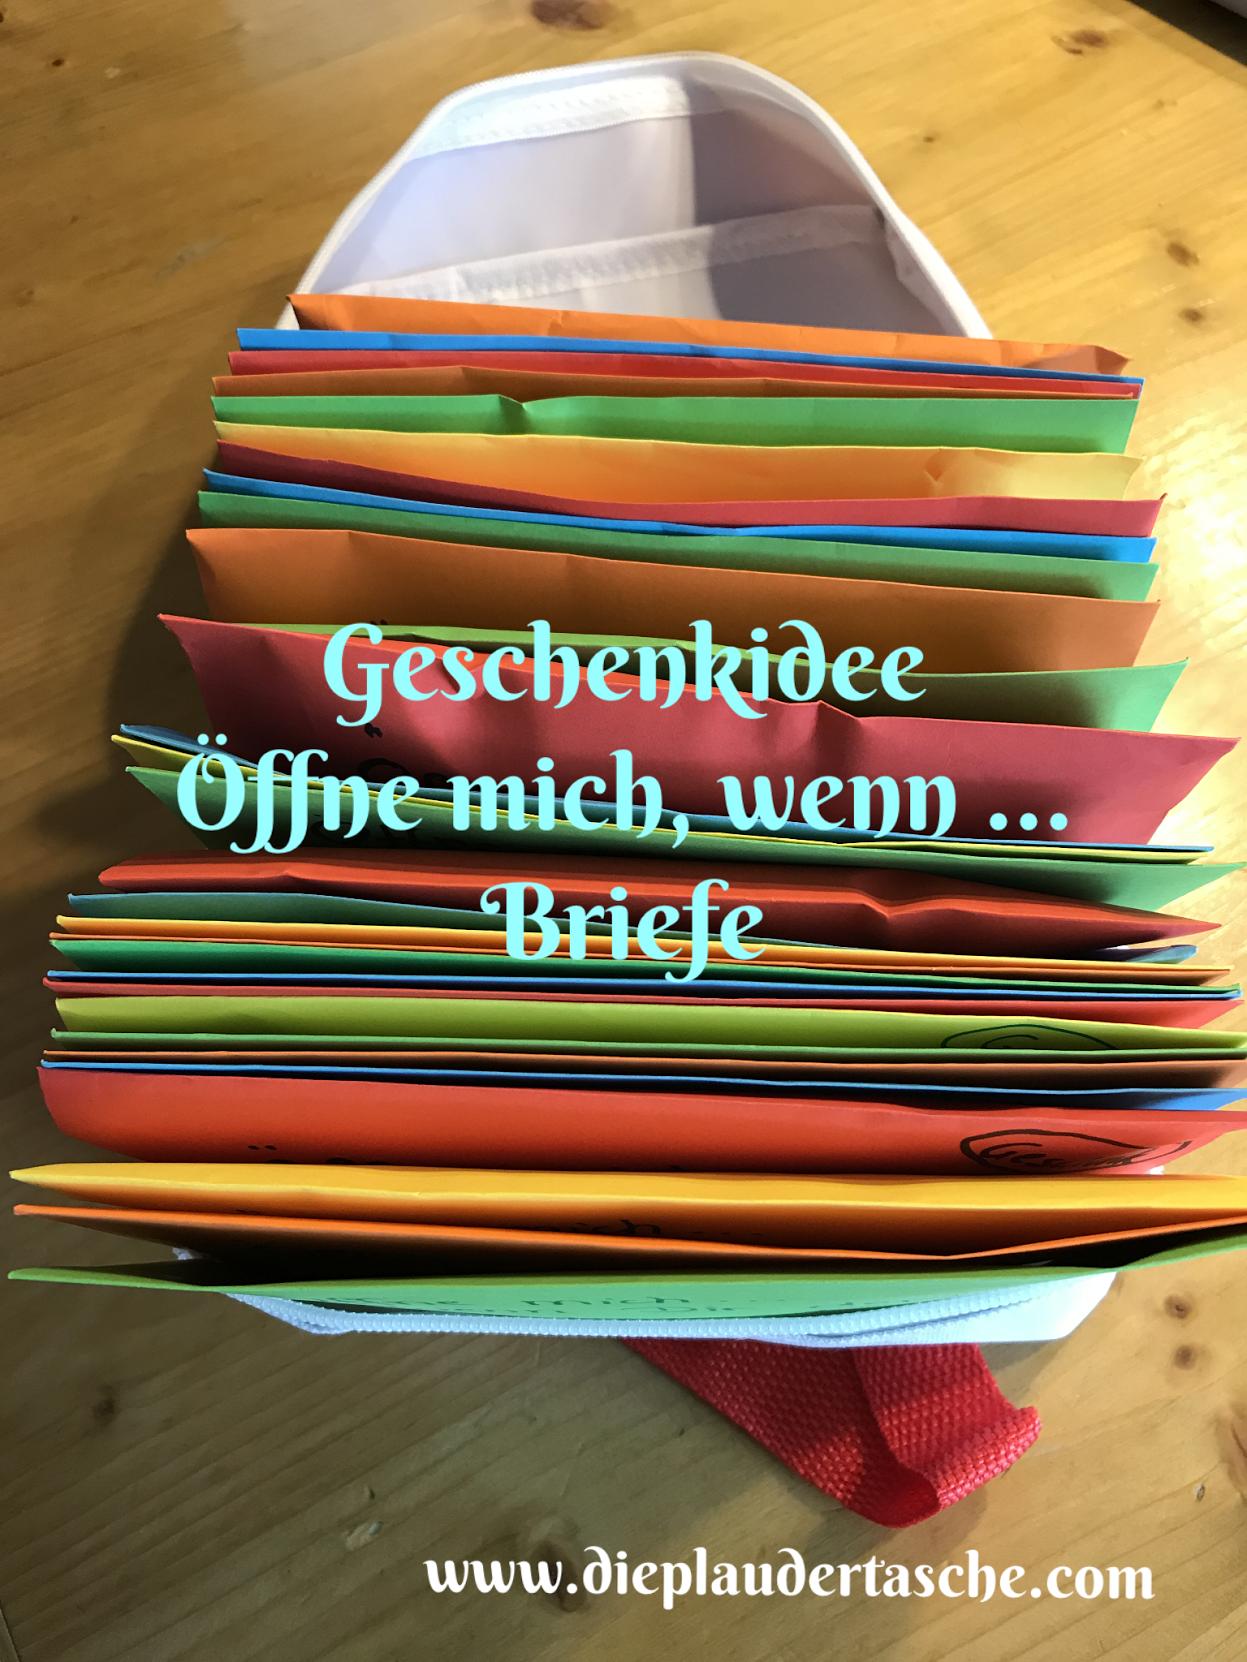 Diy Offne Mich Wenn Briefe Diy Geschenke Bester Freund Geschenkideen Freundin Geschenke